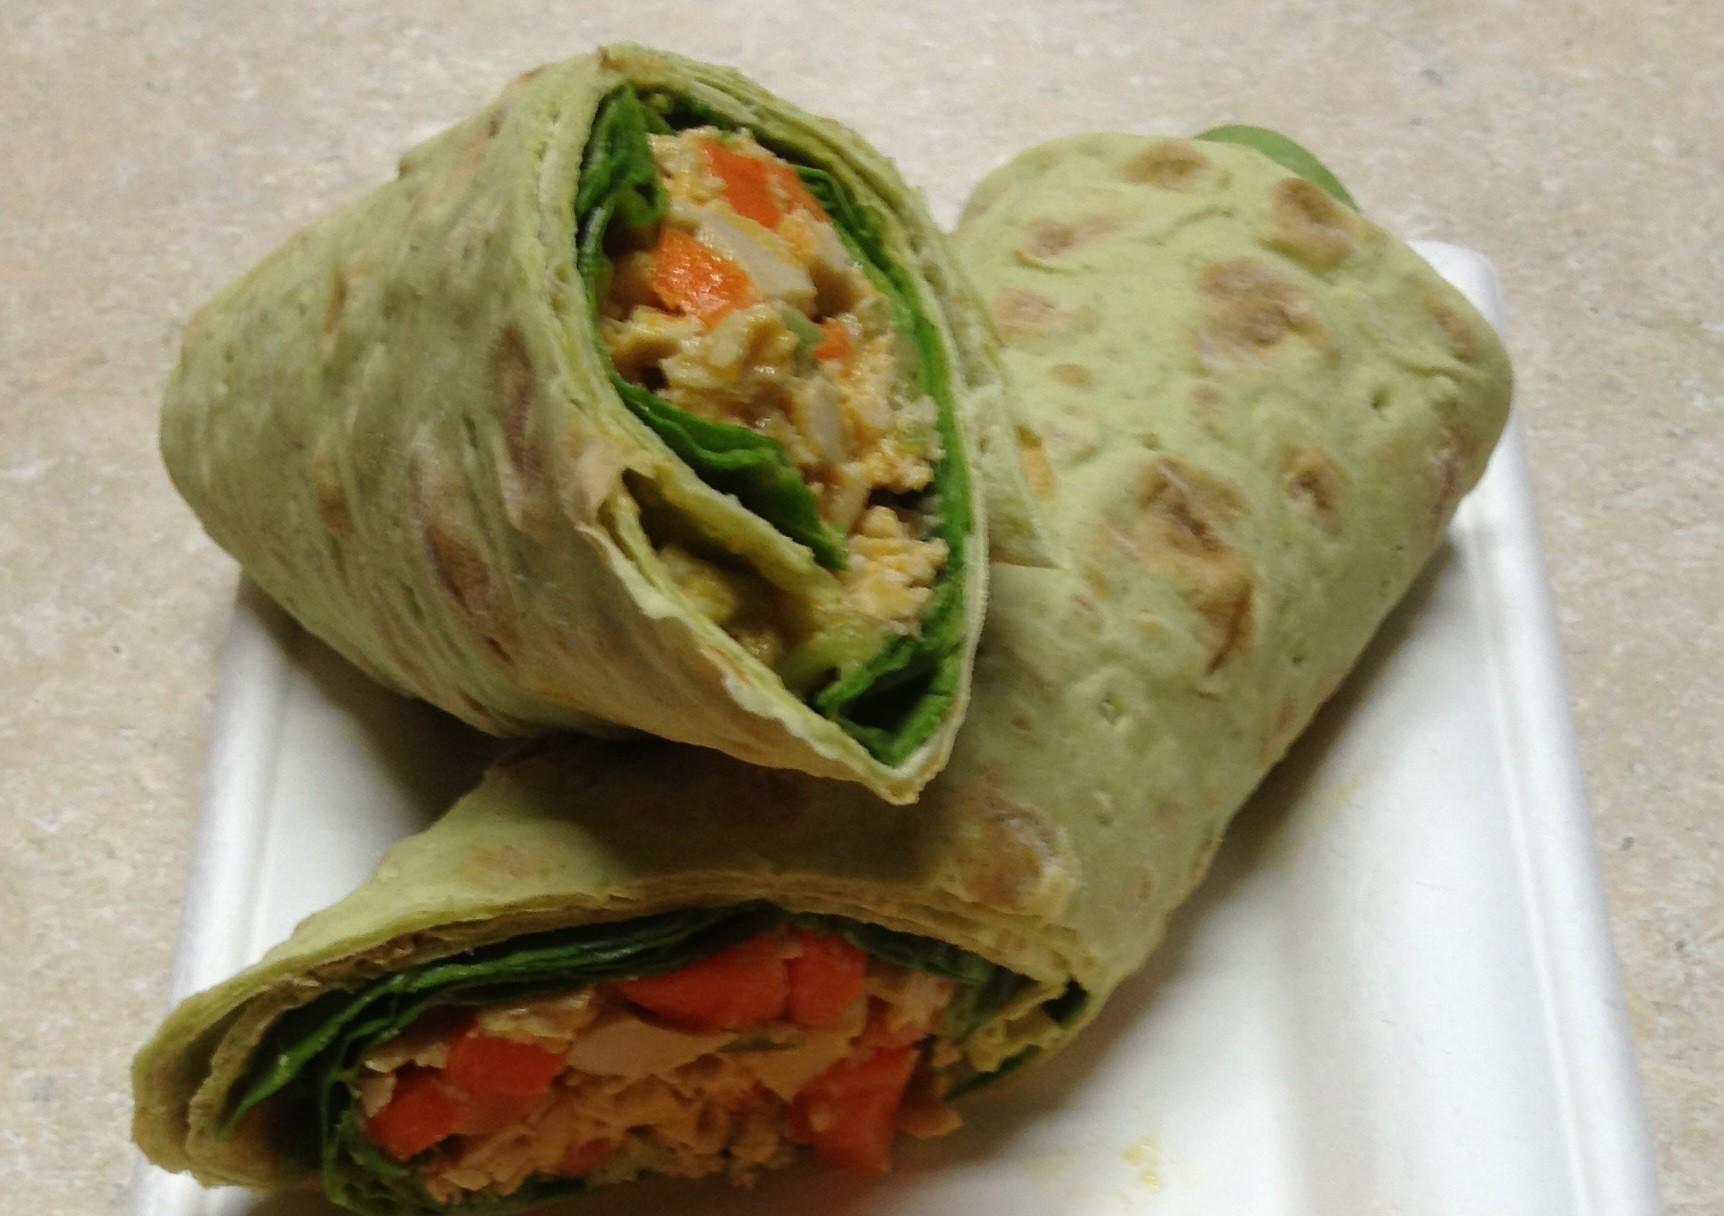 Whole Foods Vegan Buffalo Chicken Salad Recipe